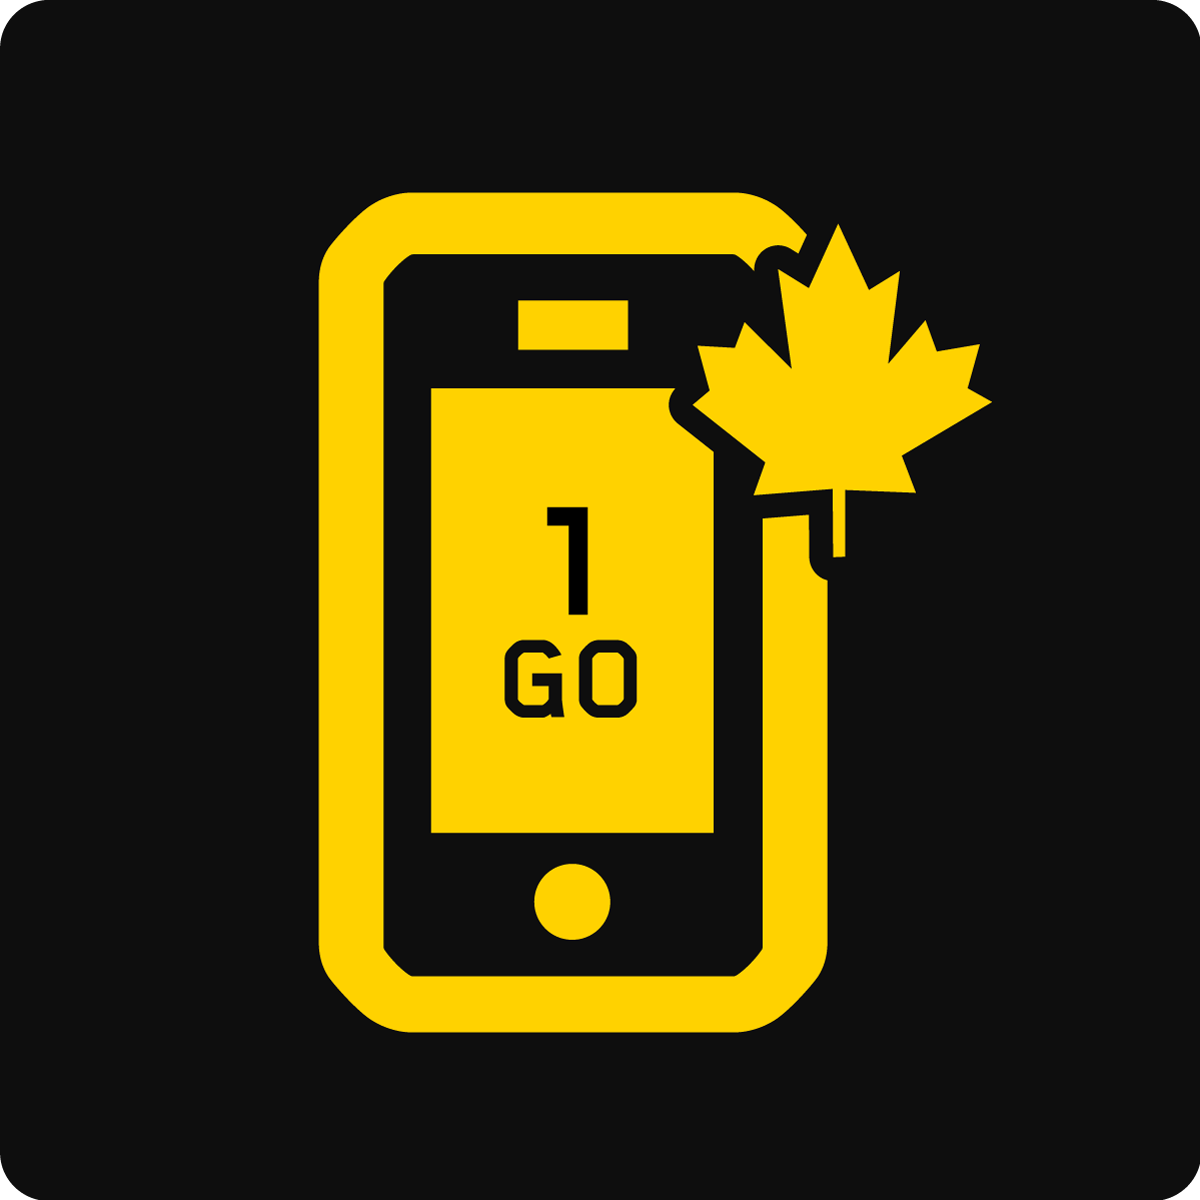 Forfait Mobile Affaires Canada 1Go